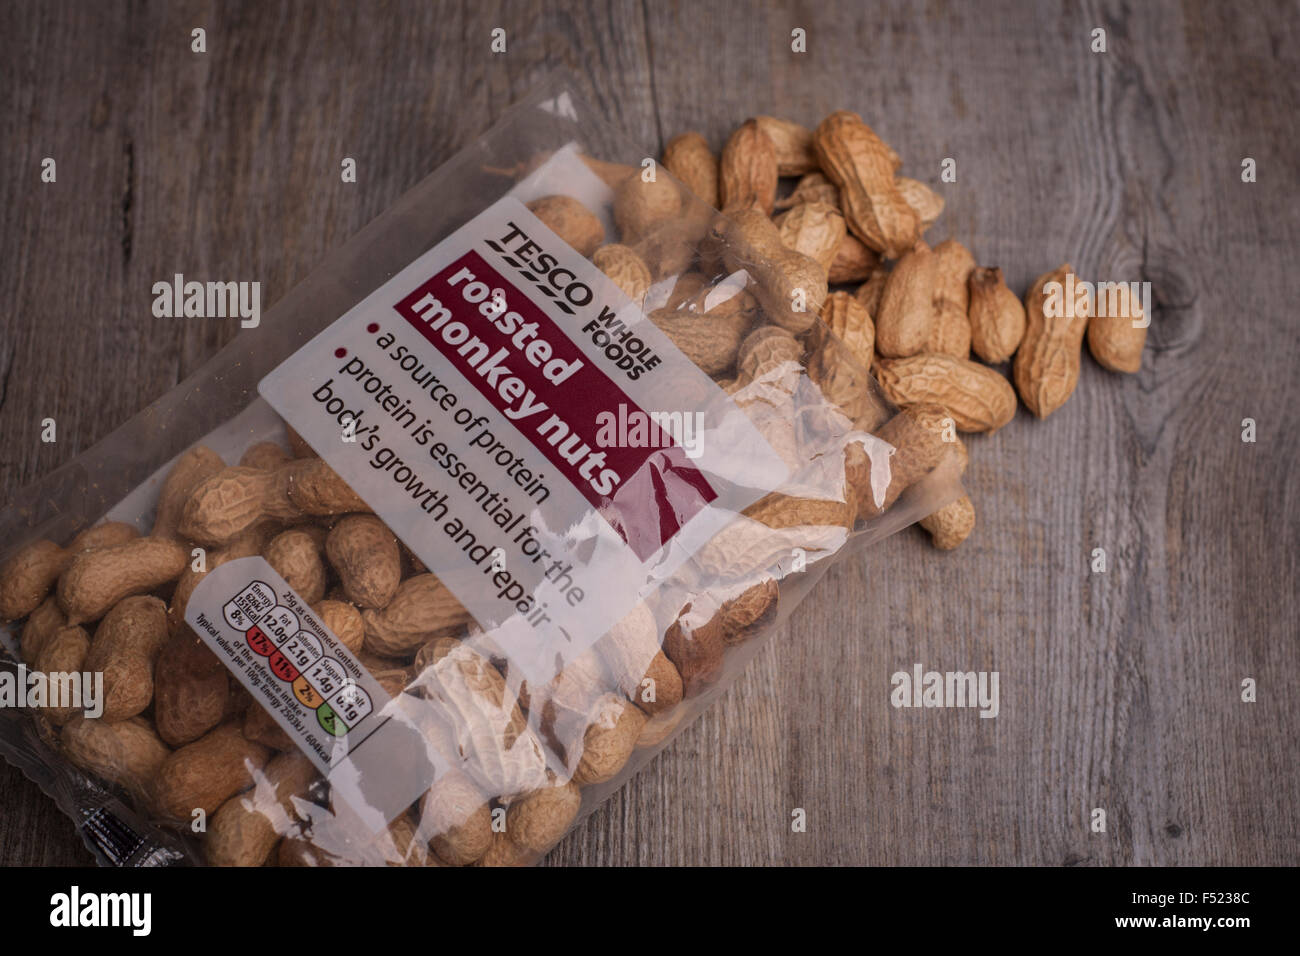 bag of Tesco monkey nuts showing RDA label - Stock Image